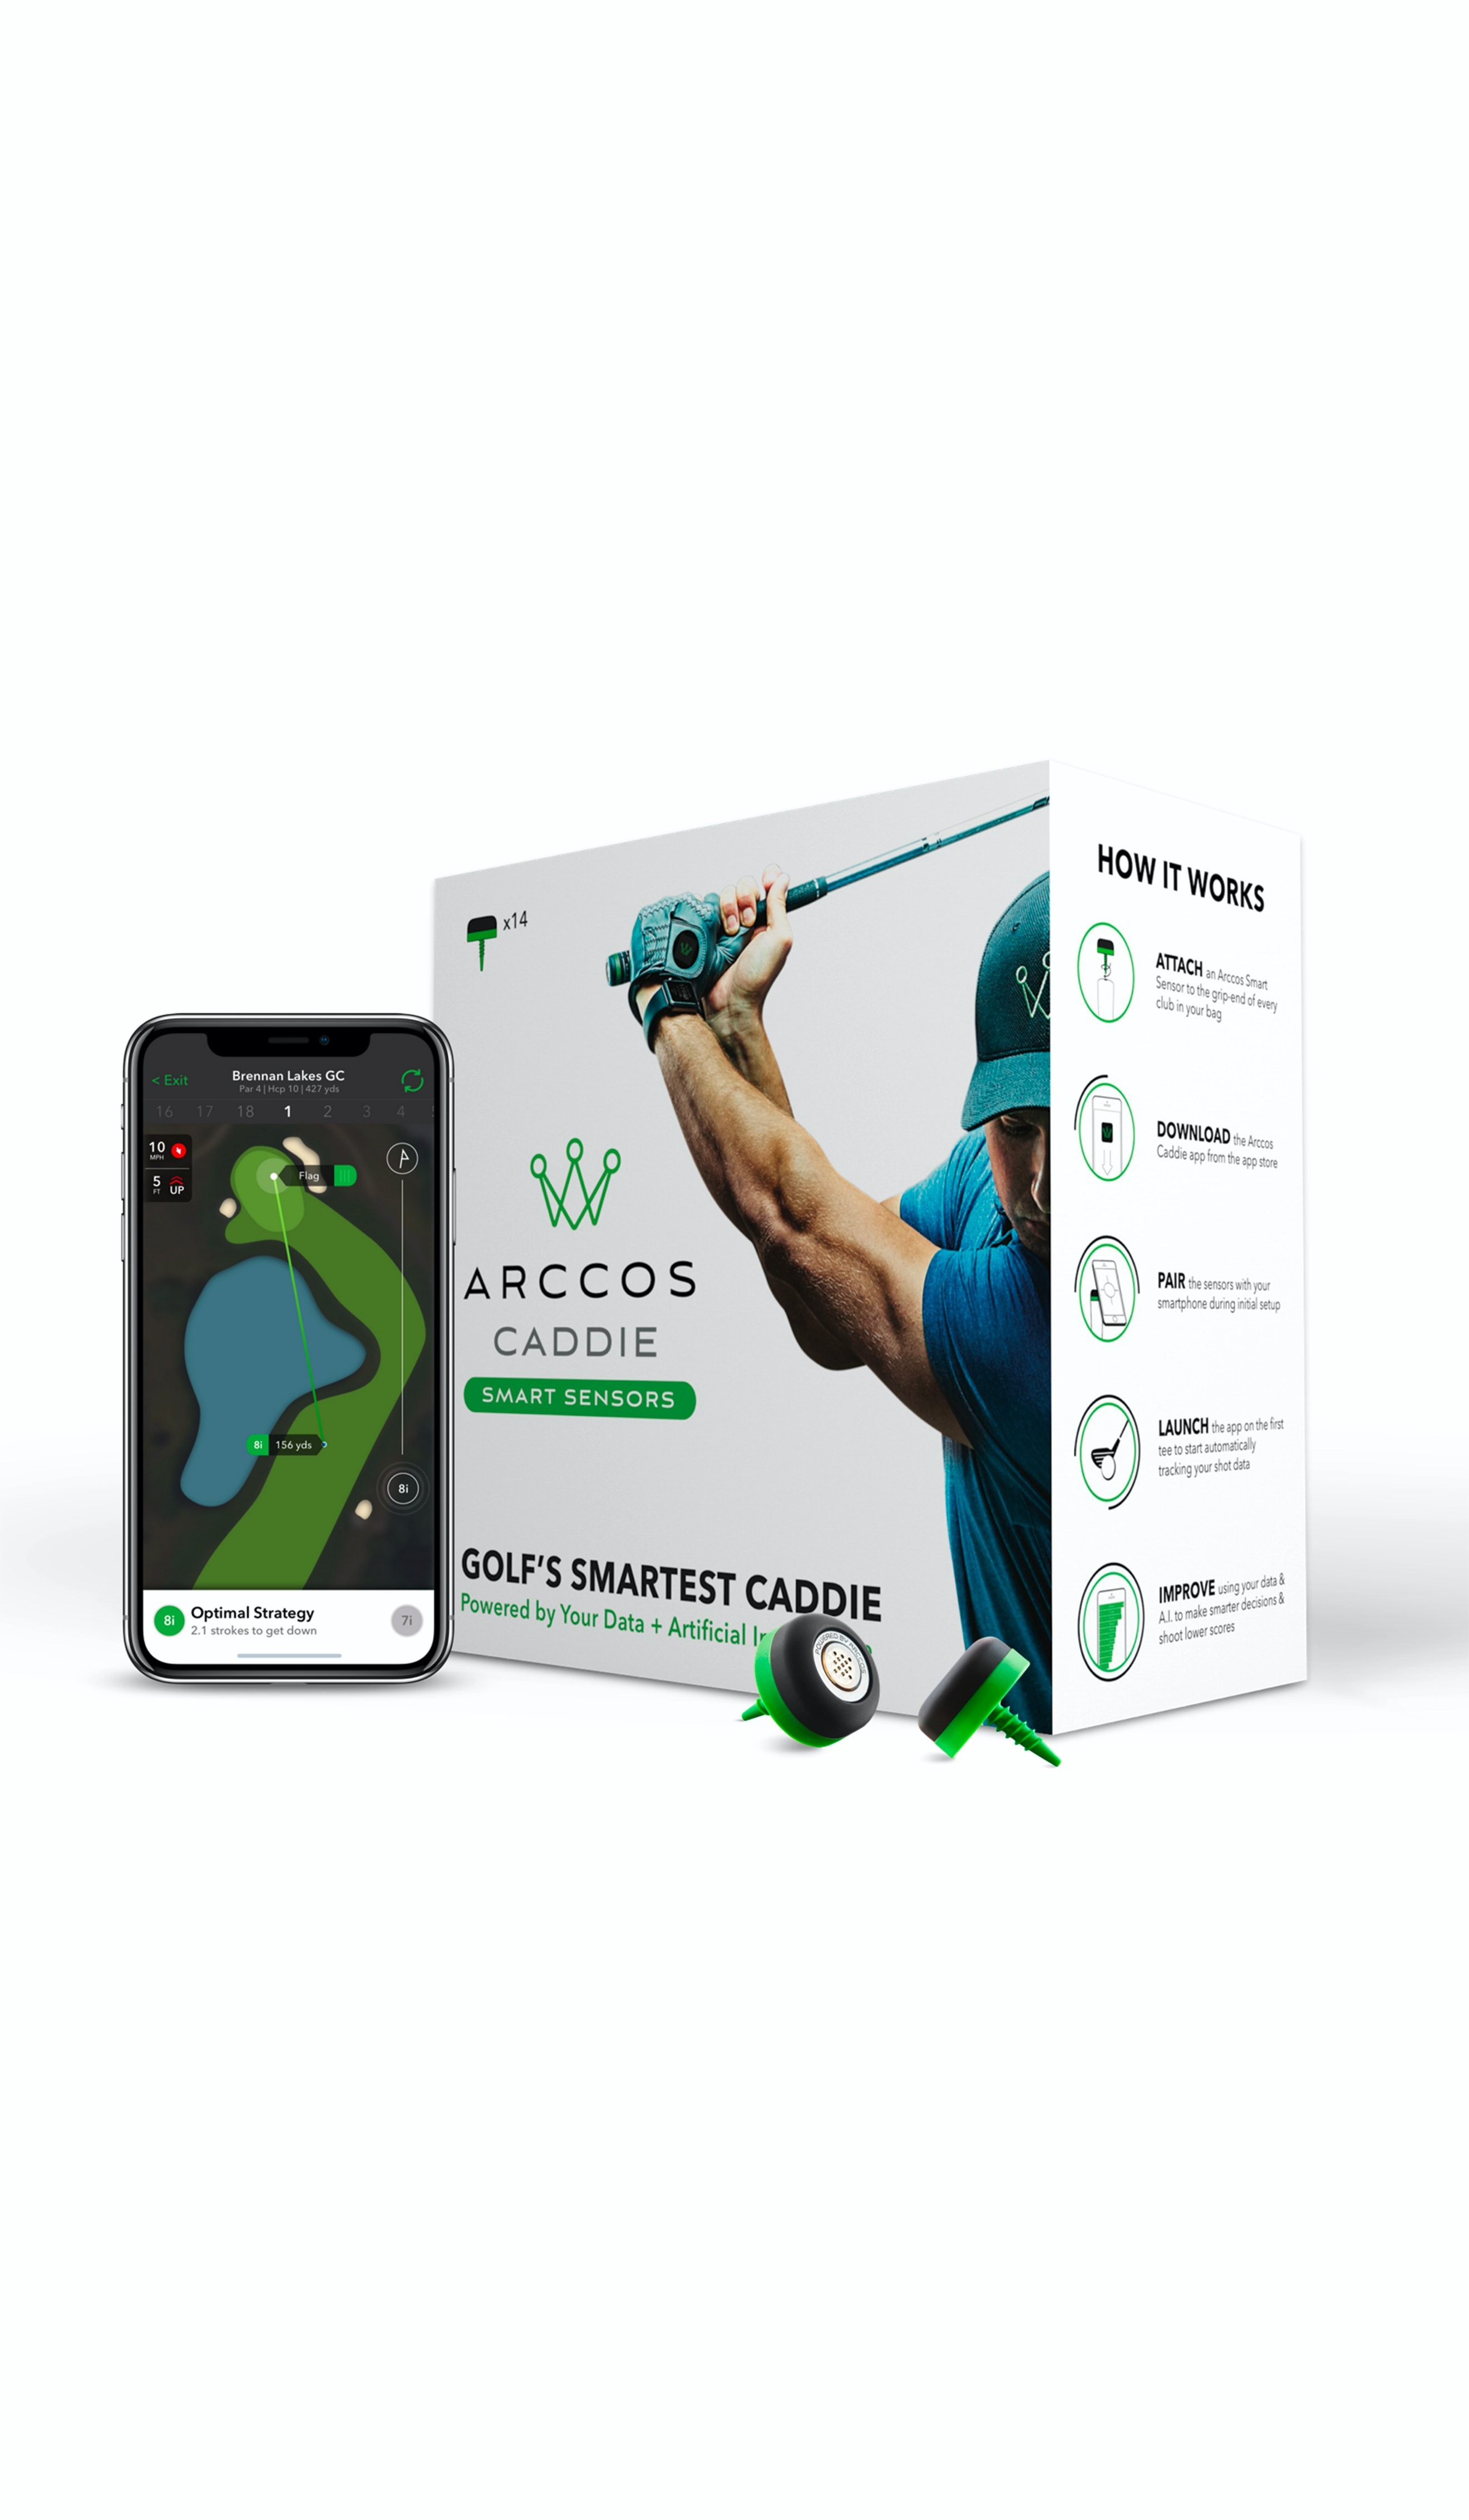 Arccos Caddie Smart Sensors sweepstakes